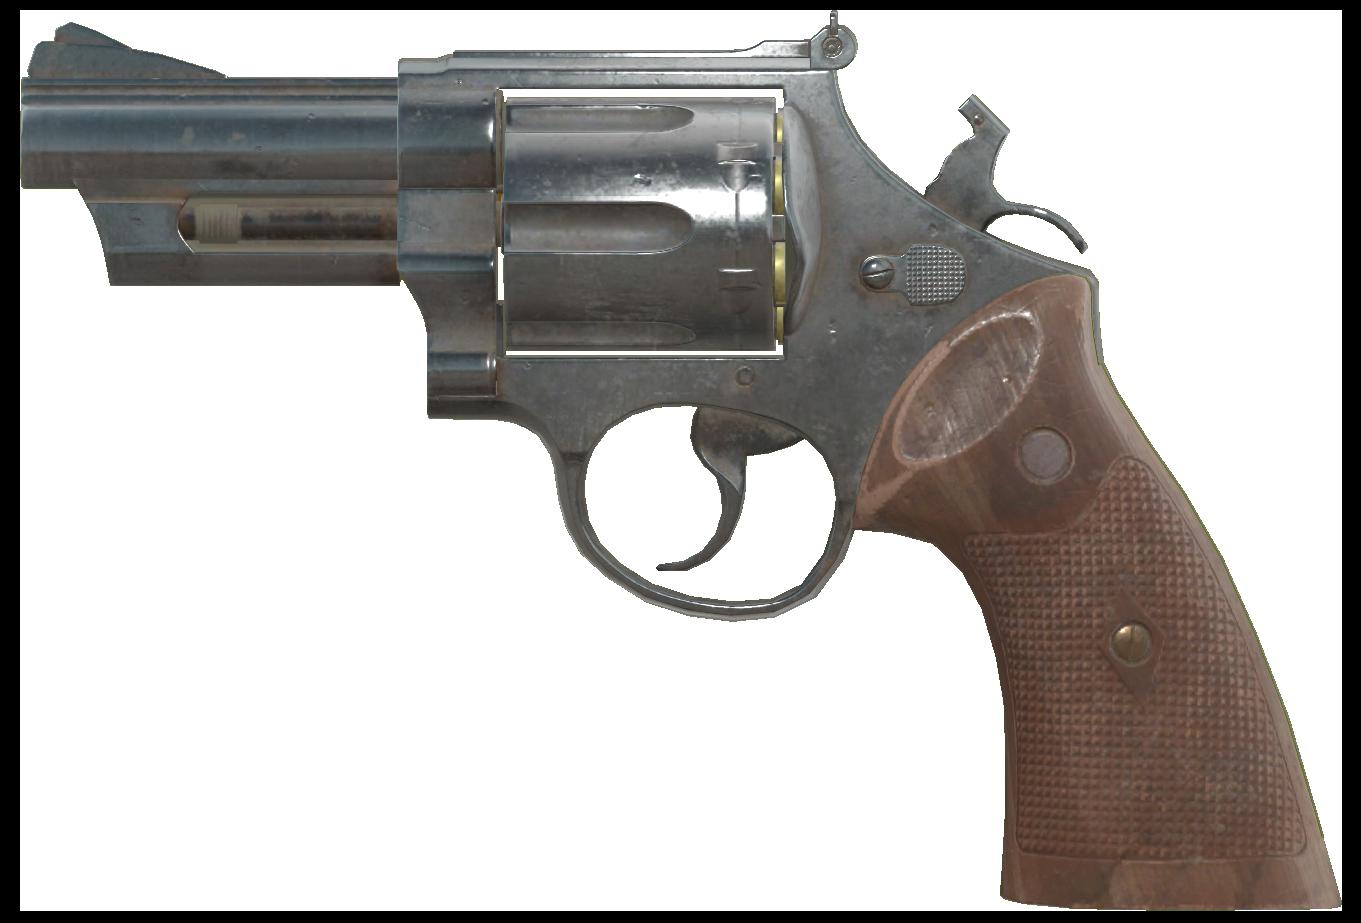 File:44 pistol.png